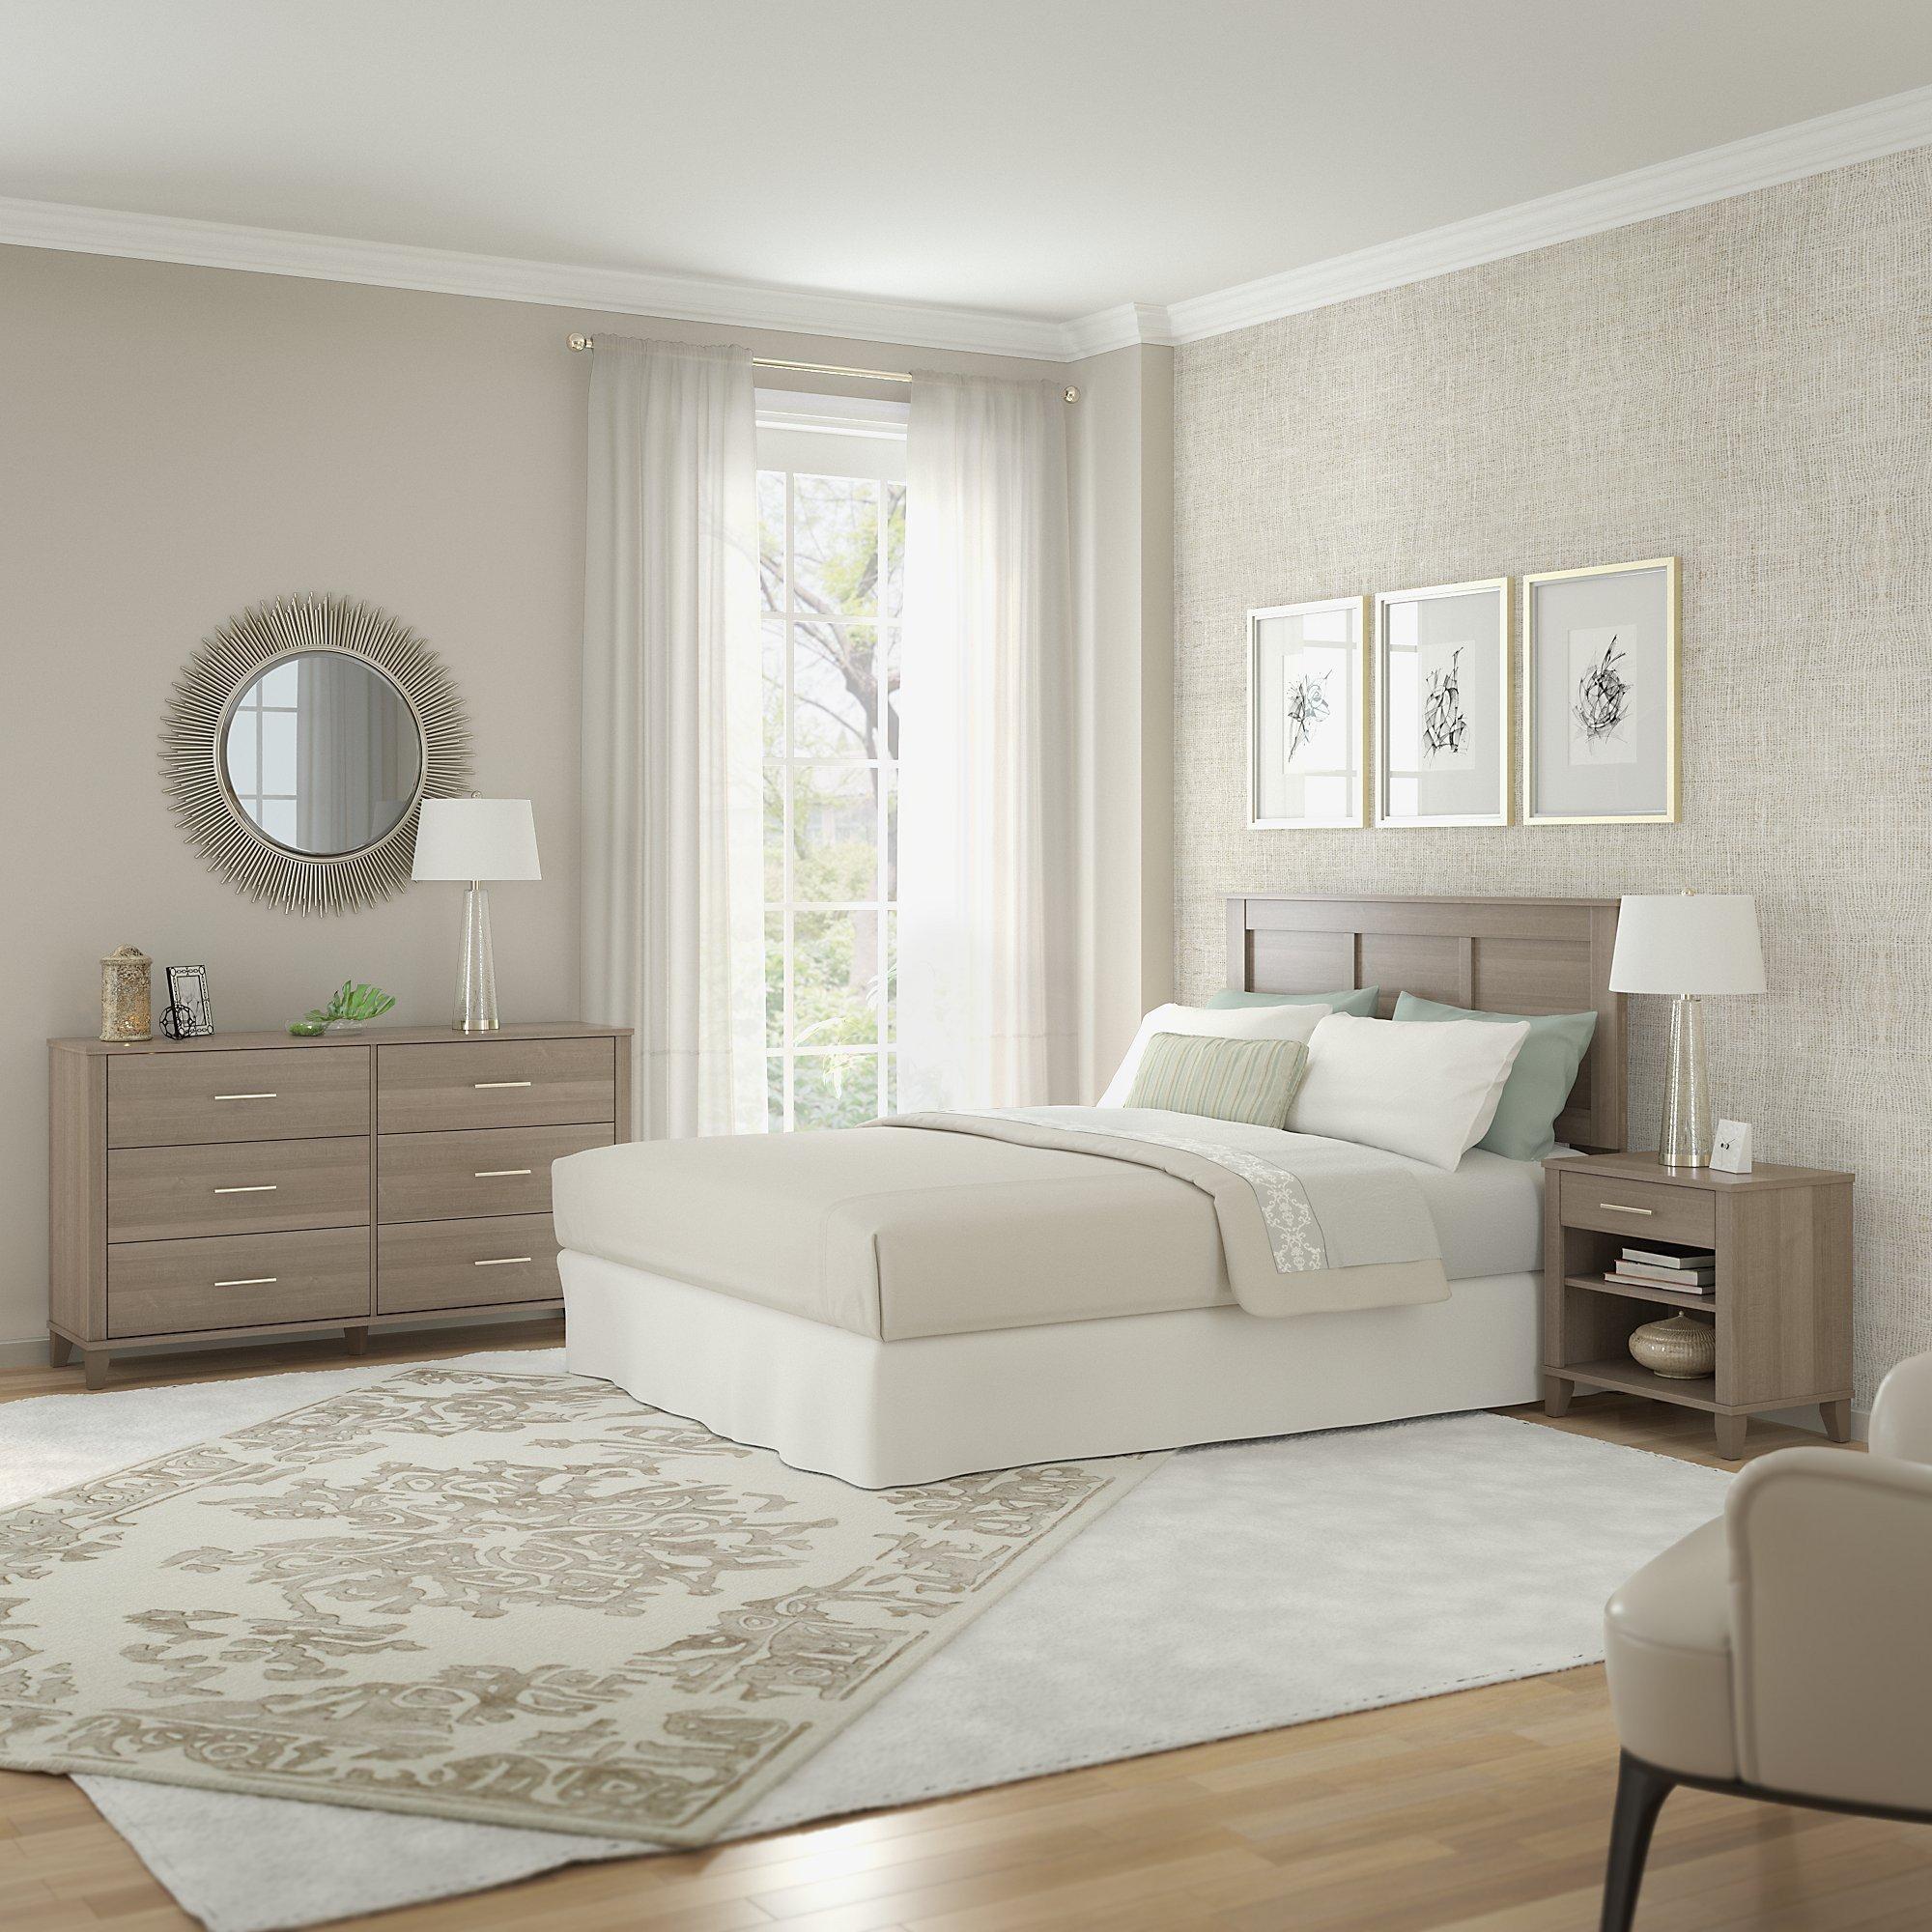 Dresser and night stand bestdressers 2017 for Headboard dresser and nightstand set